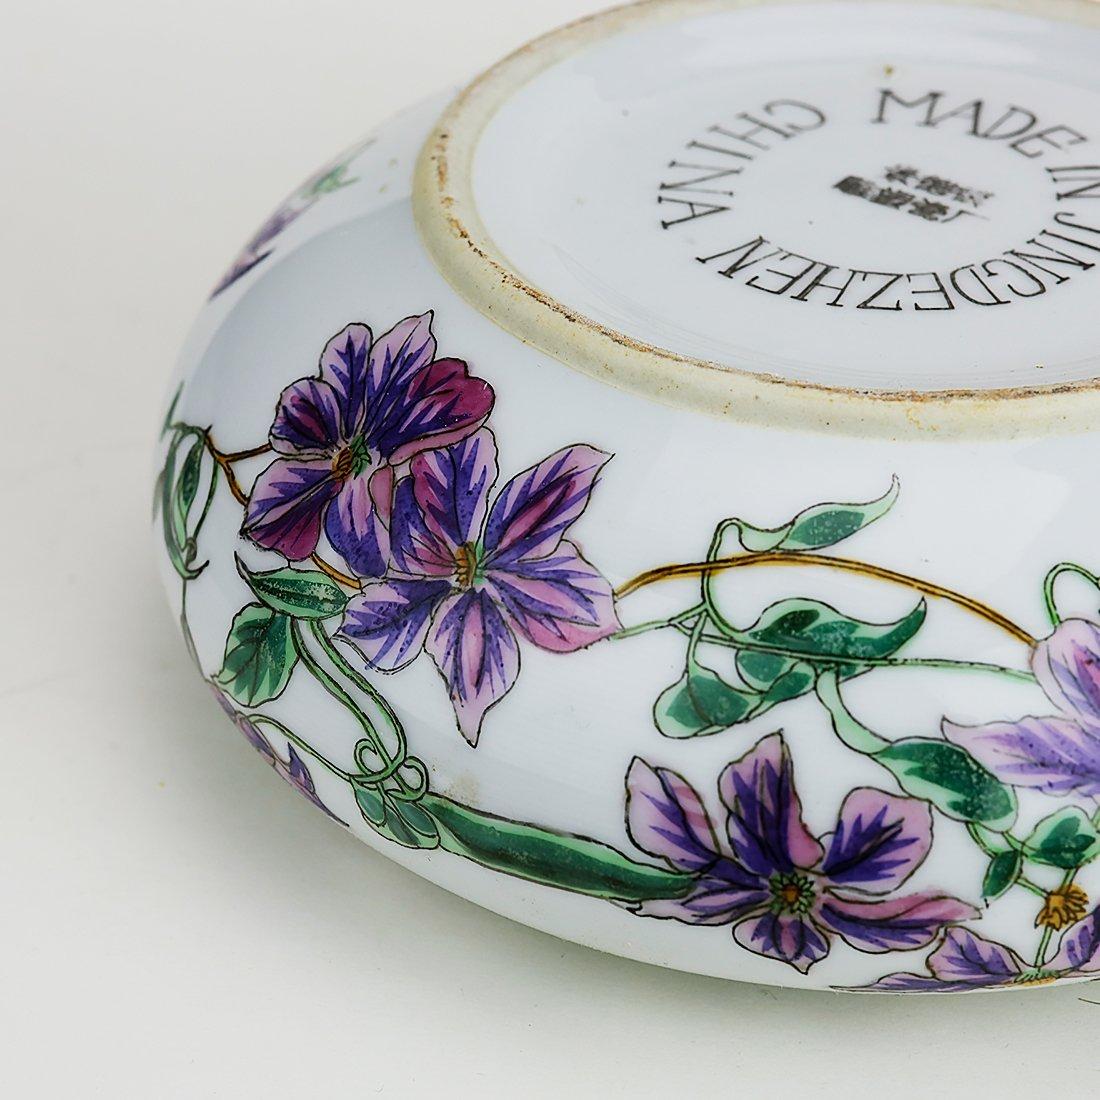 Chinese porcelain writing-brush wash, Jingdezhen - 6